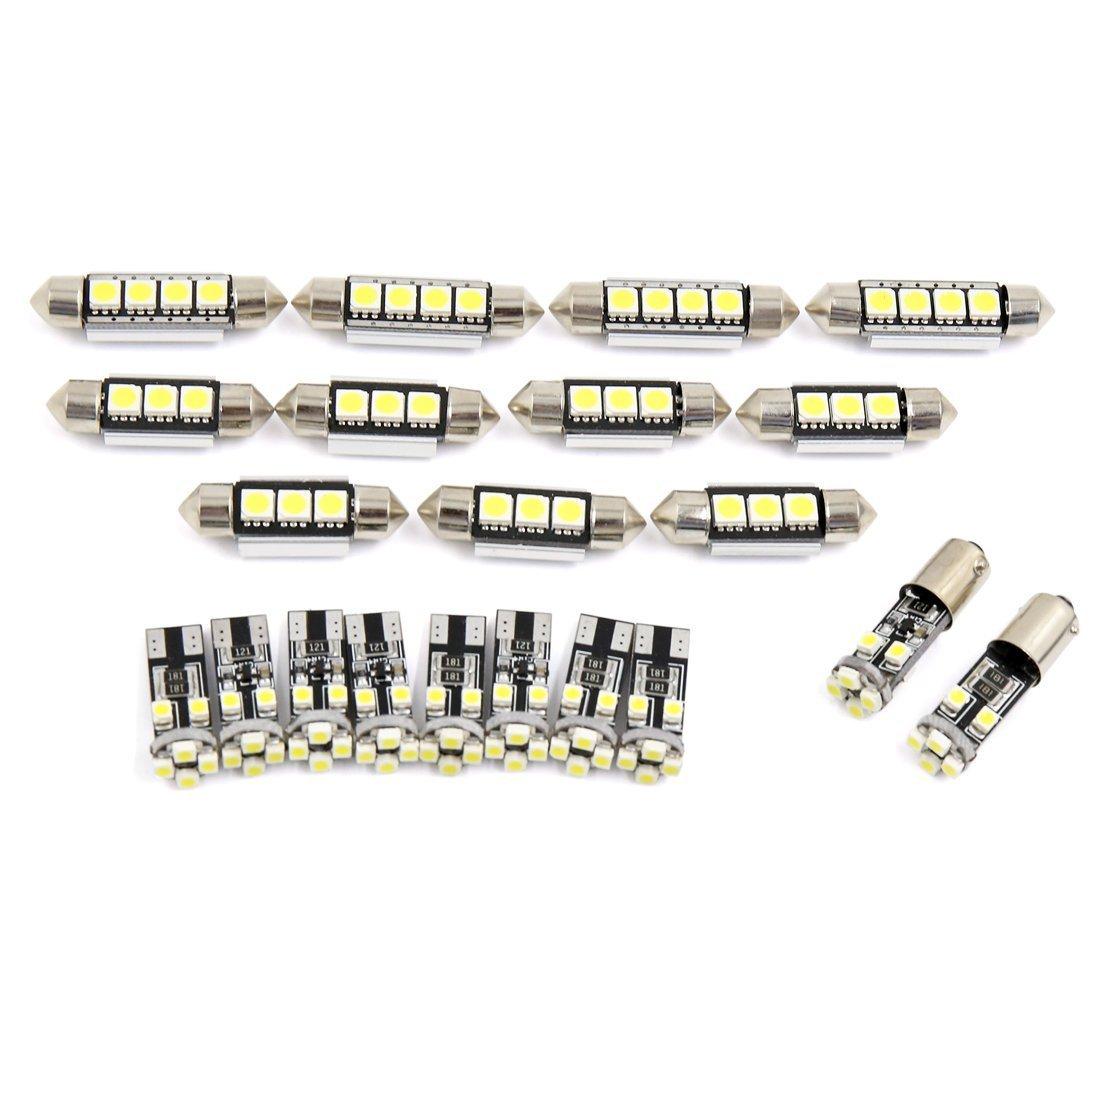 Zantec 21pcs White Festoon LED Light Bulbs LED Car Interior Lights Map Dome Reading Lights Bulbs Set for BMW E46 Sedan Coupe M3 1999-2005 Canbus